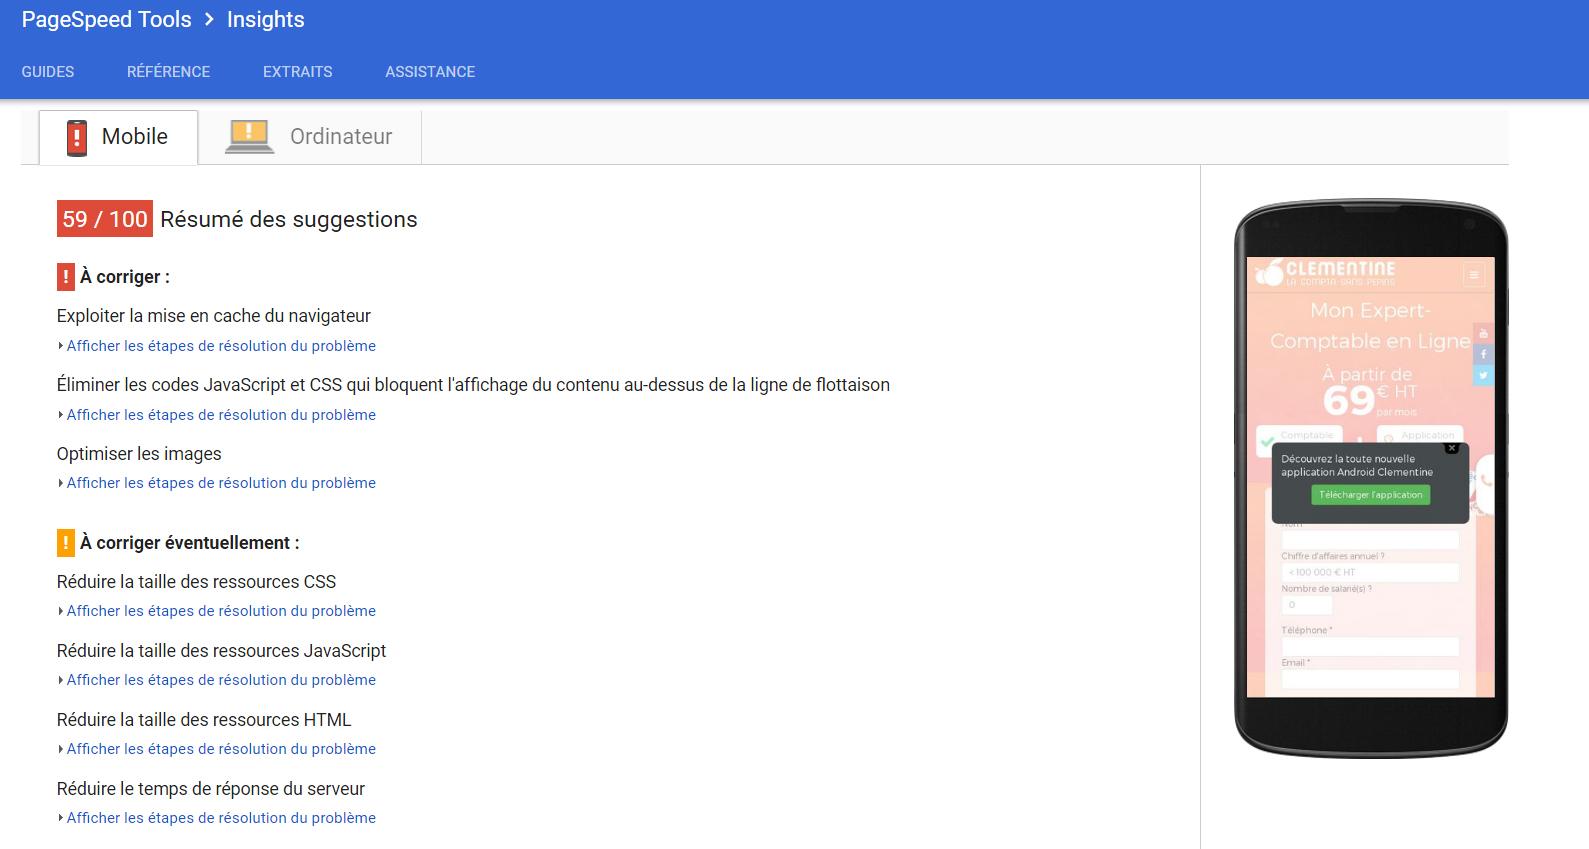 Test d'une page sur l'outil Google PageSpeed Insights